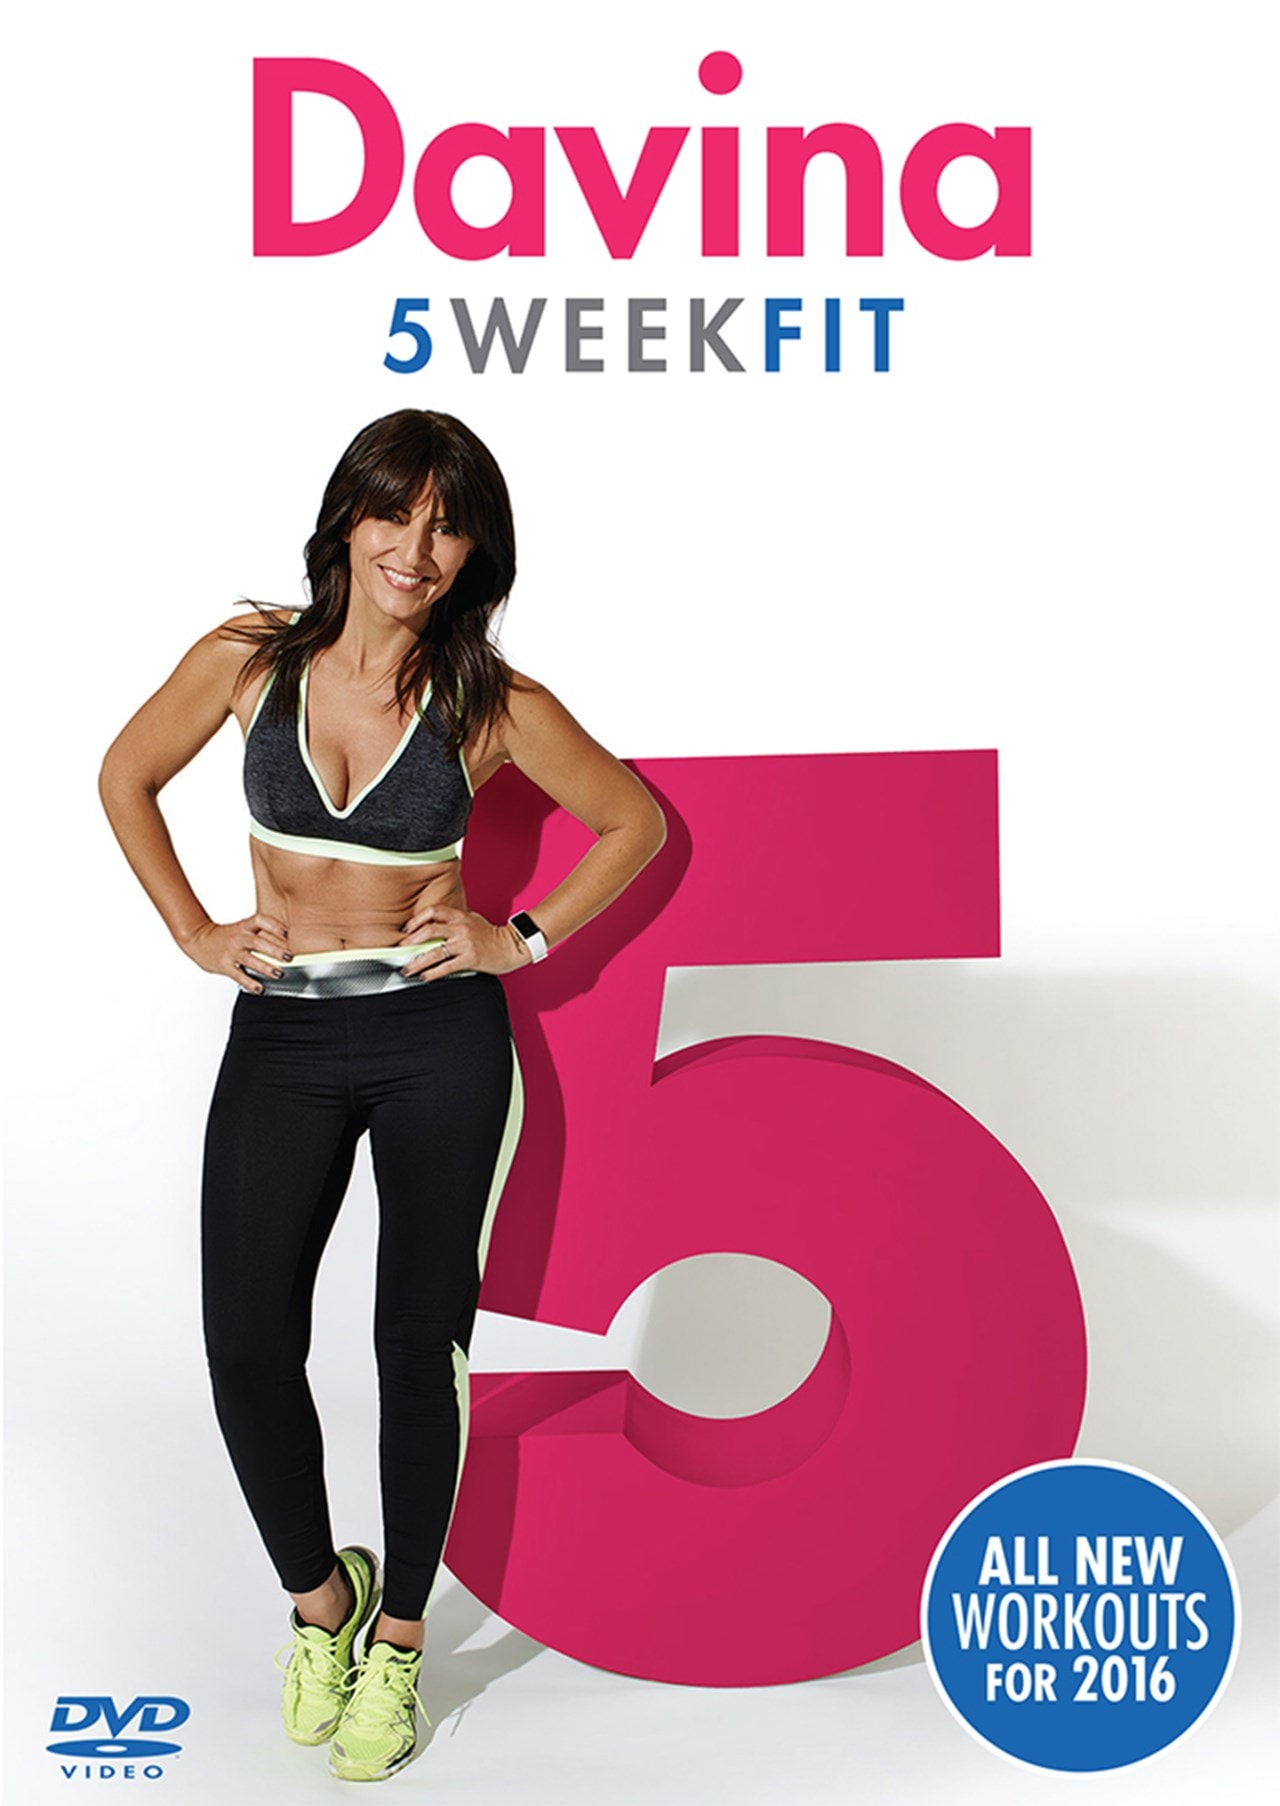 Davina: 5 Week Fit - 1